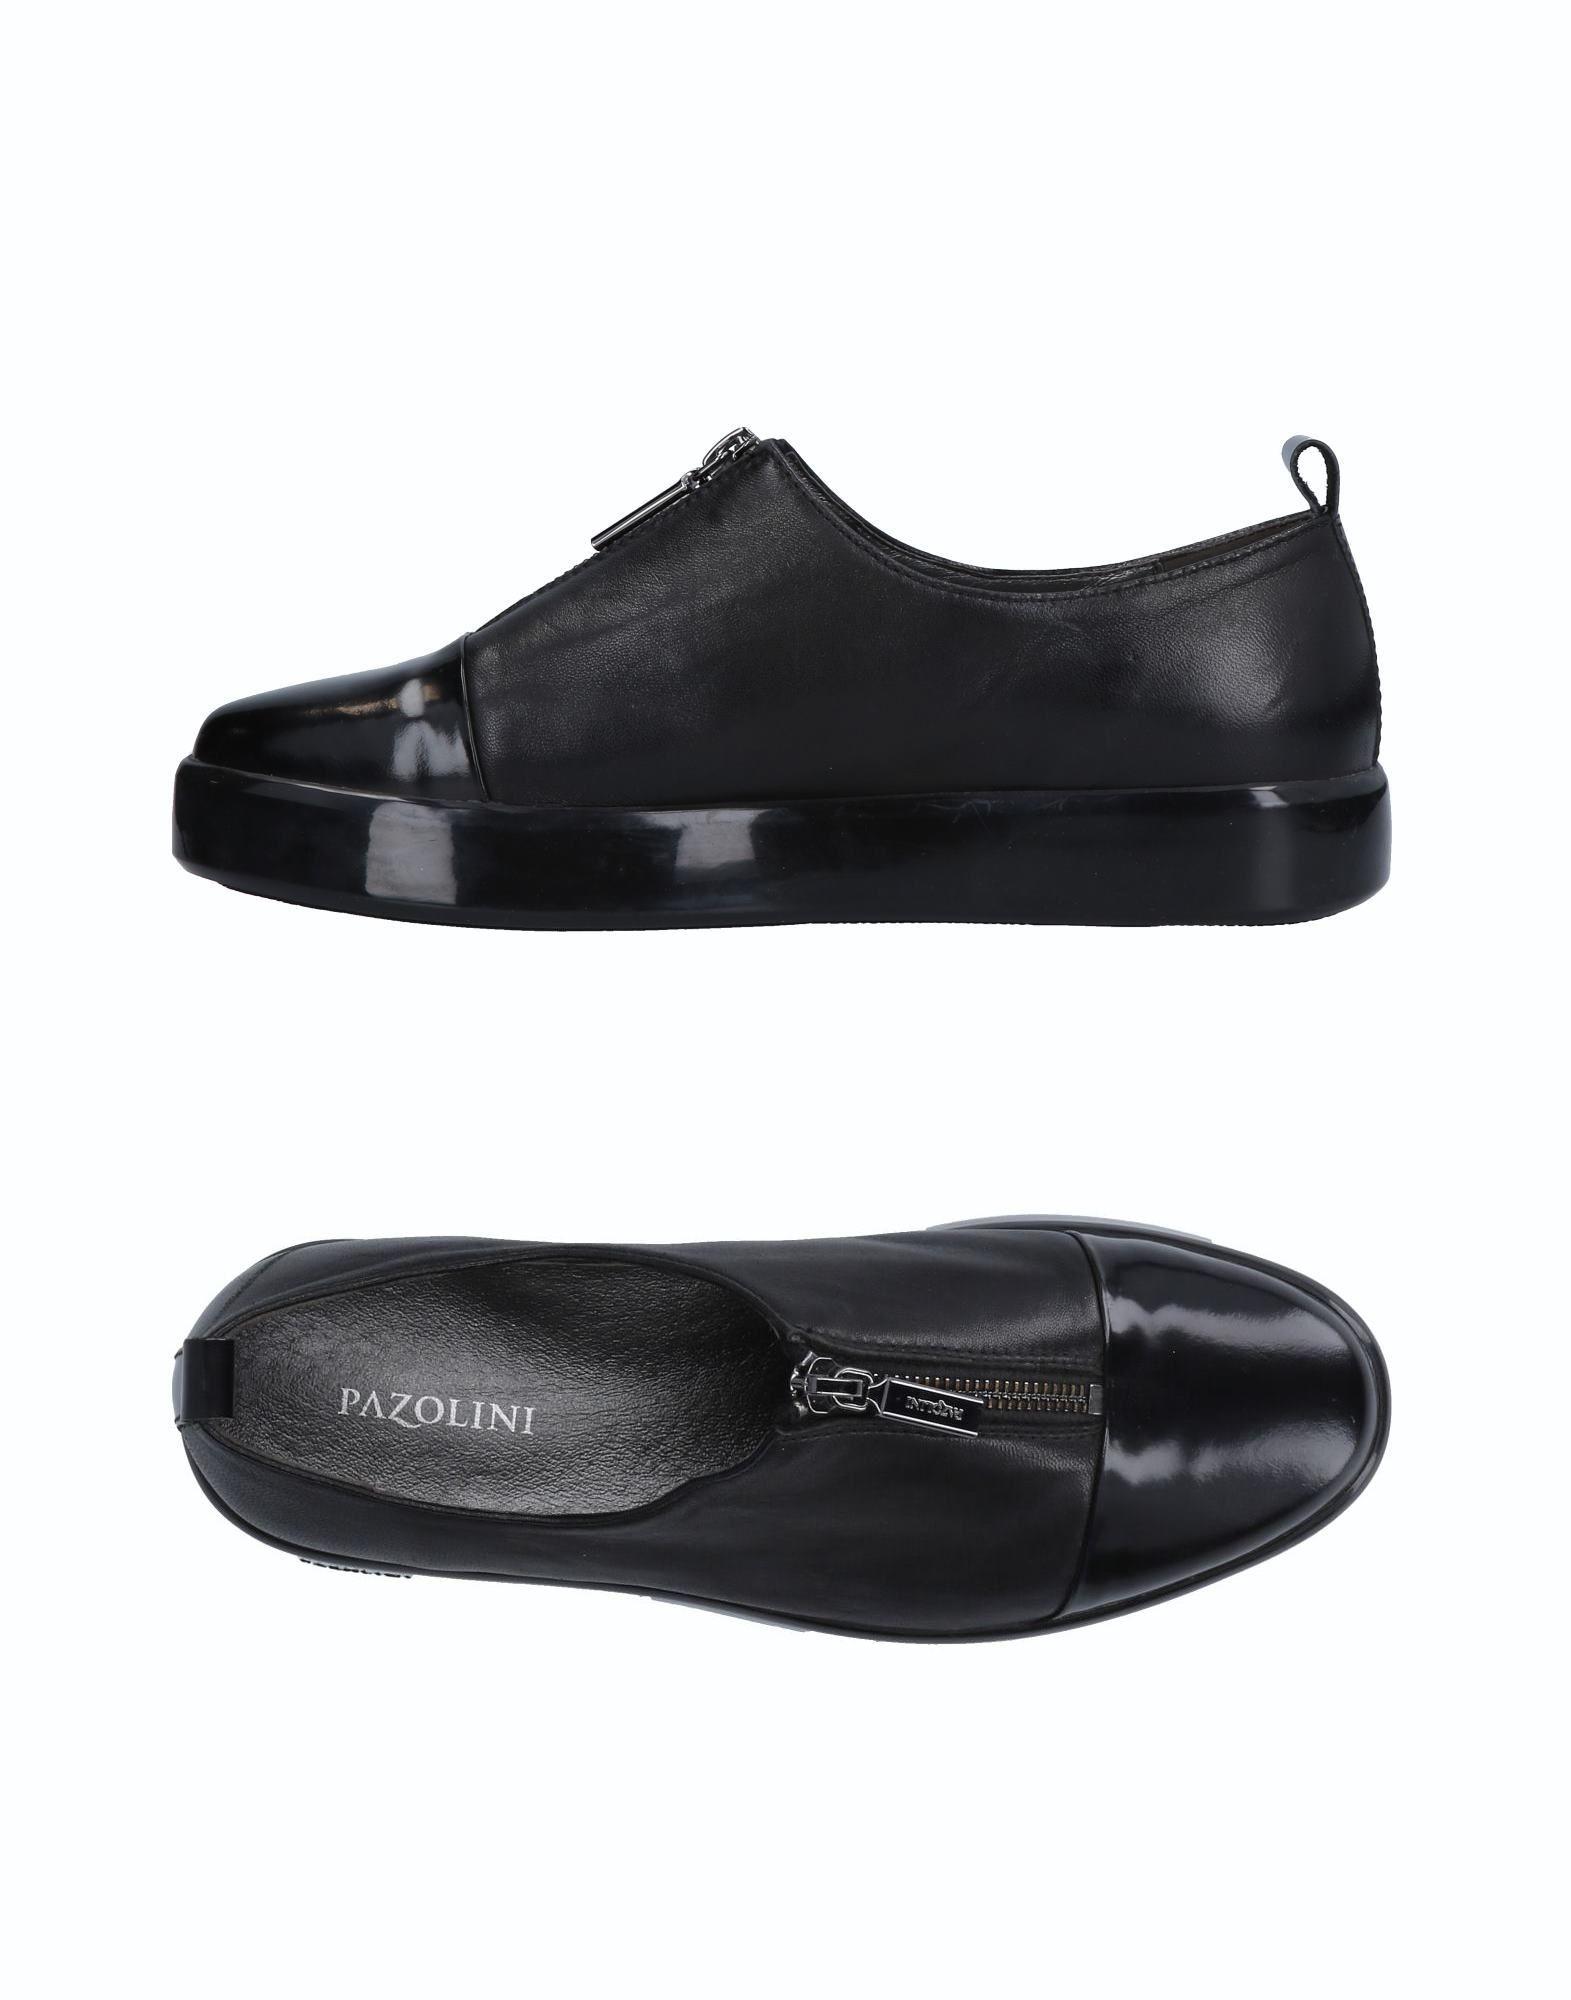 Carlo Pazolini Mokassins Damen  11509960VN Gute Qualität beliebte Schuhe